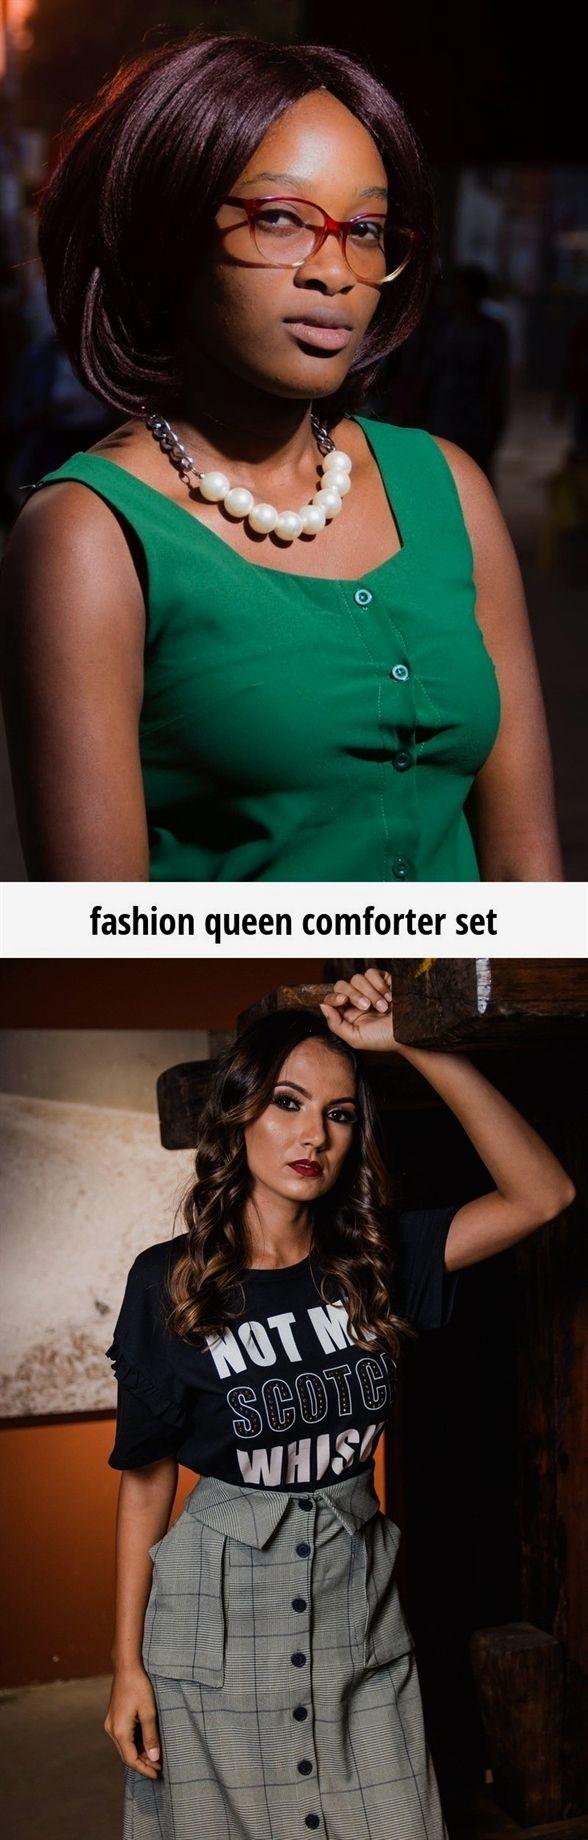 Fashion queen comforter set fashion th